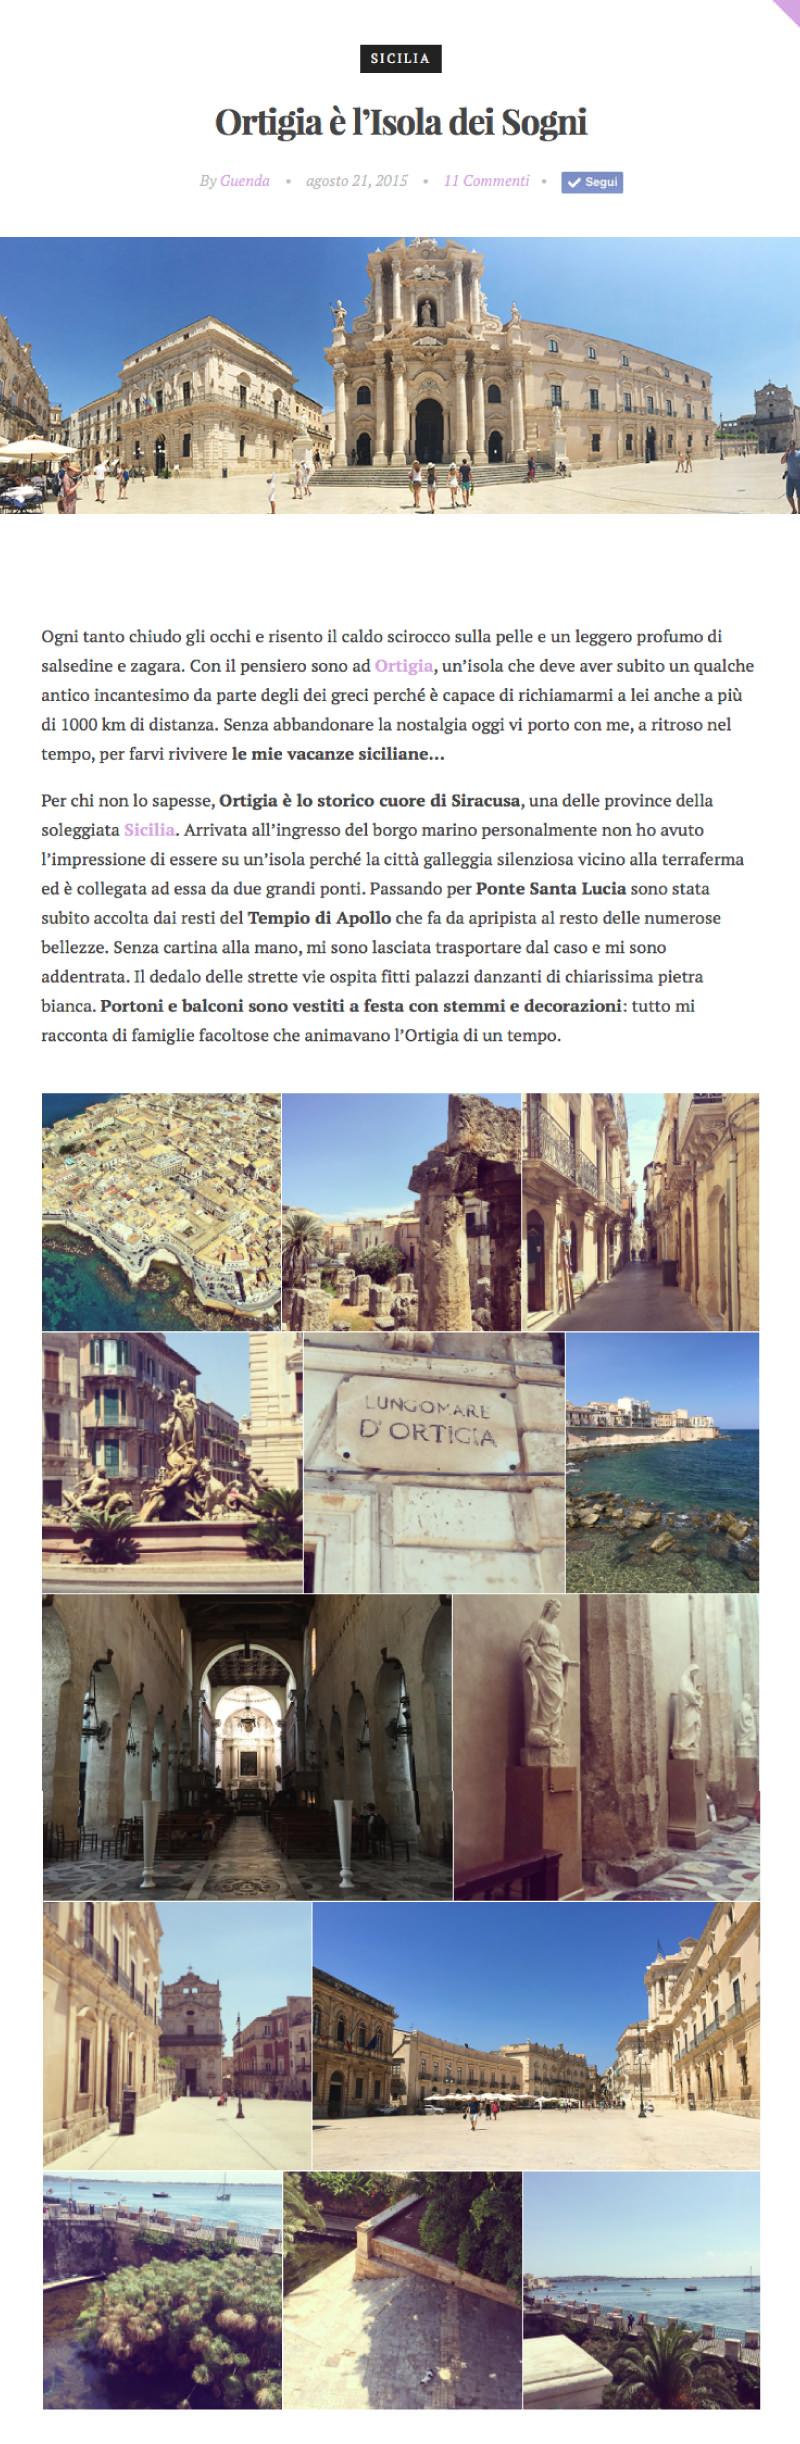 Pagina-Viaggi-di-Guenda_10.jpg